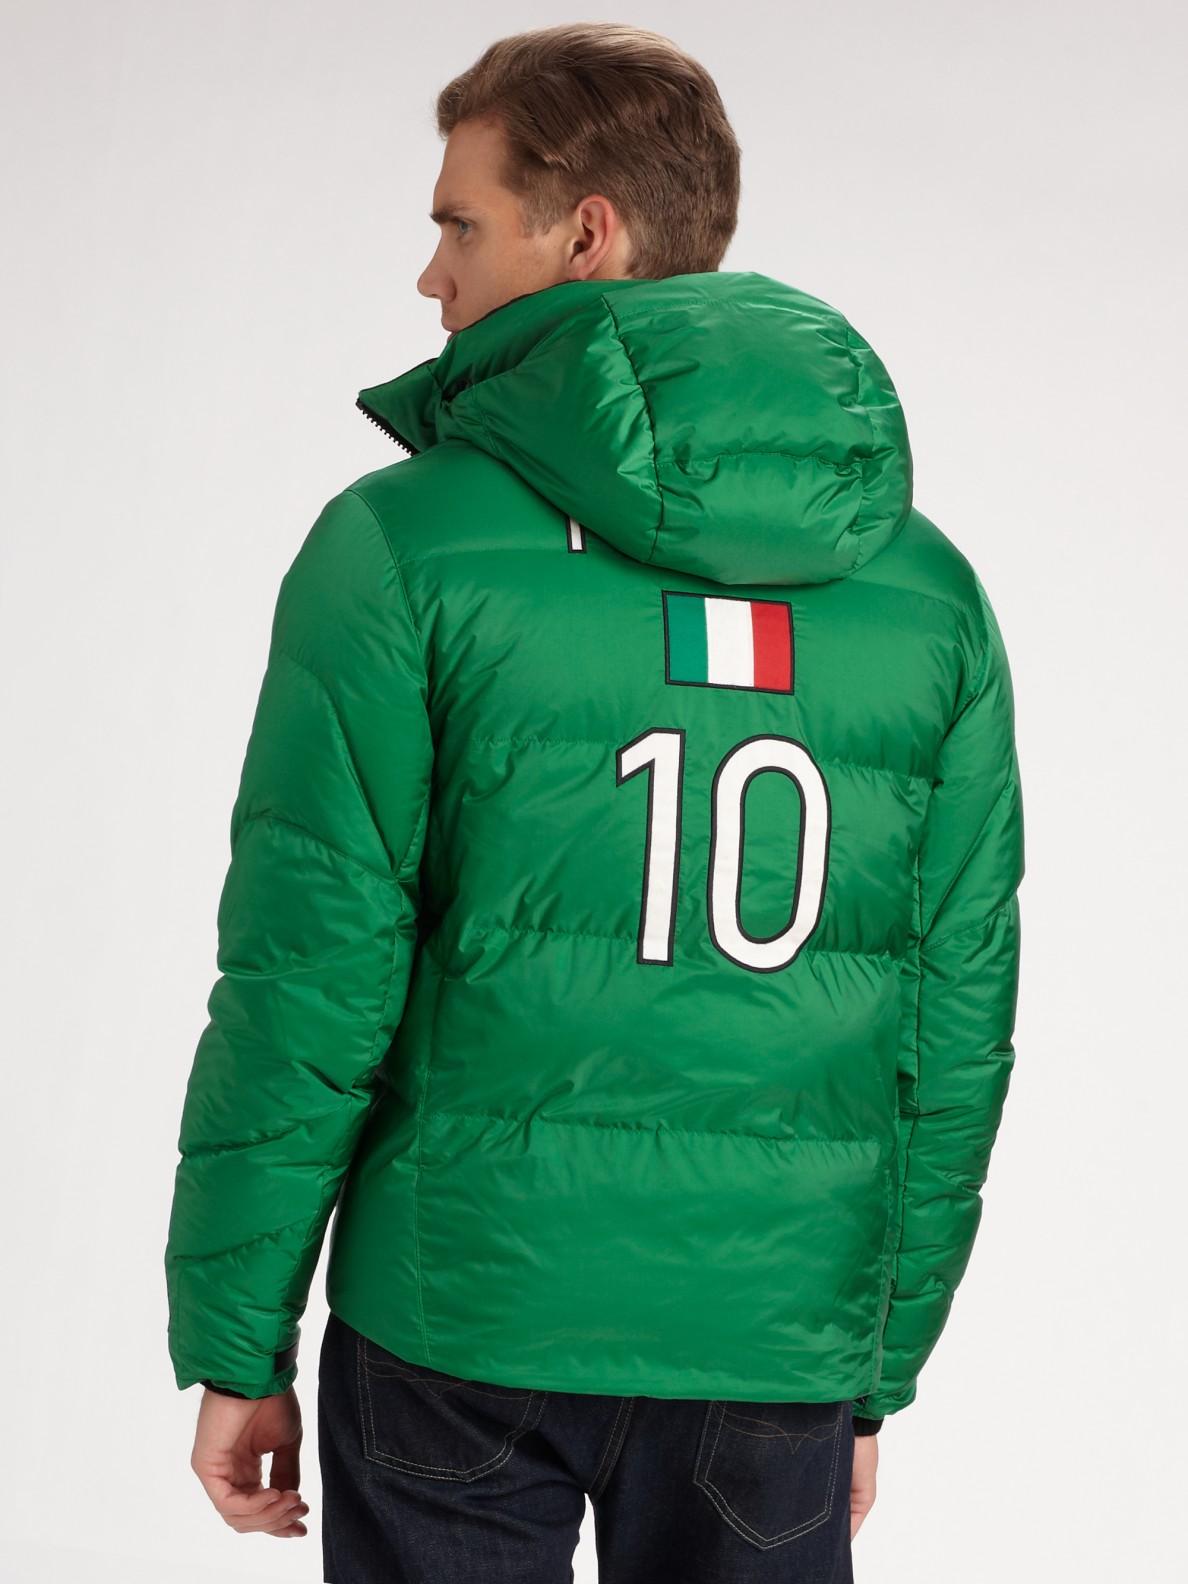 Polo Lumvpgszq Ralph Lauren Jacket Italy PTXkuZiO